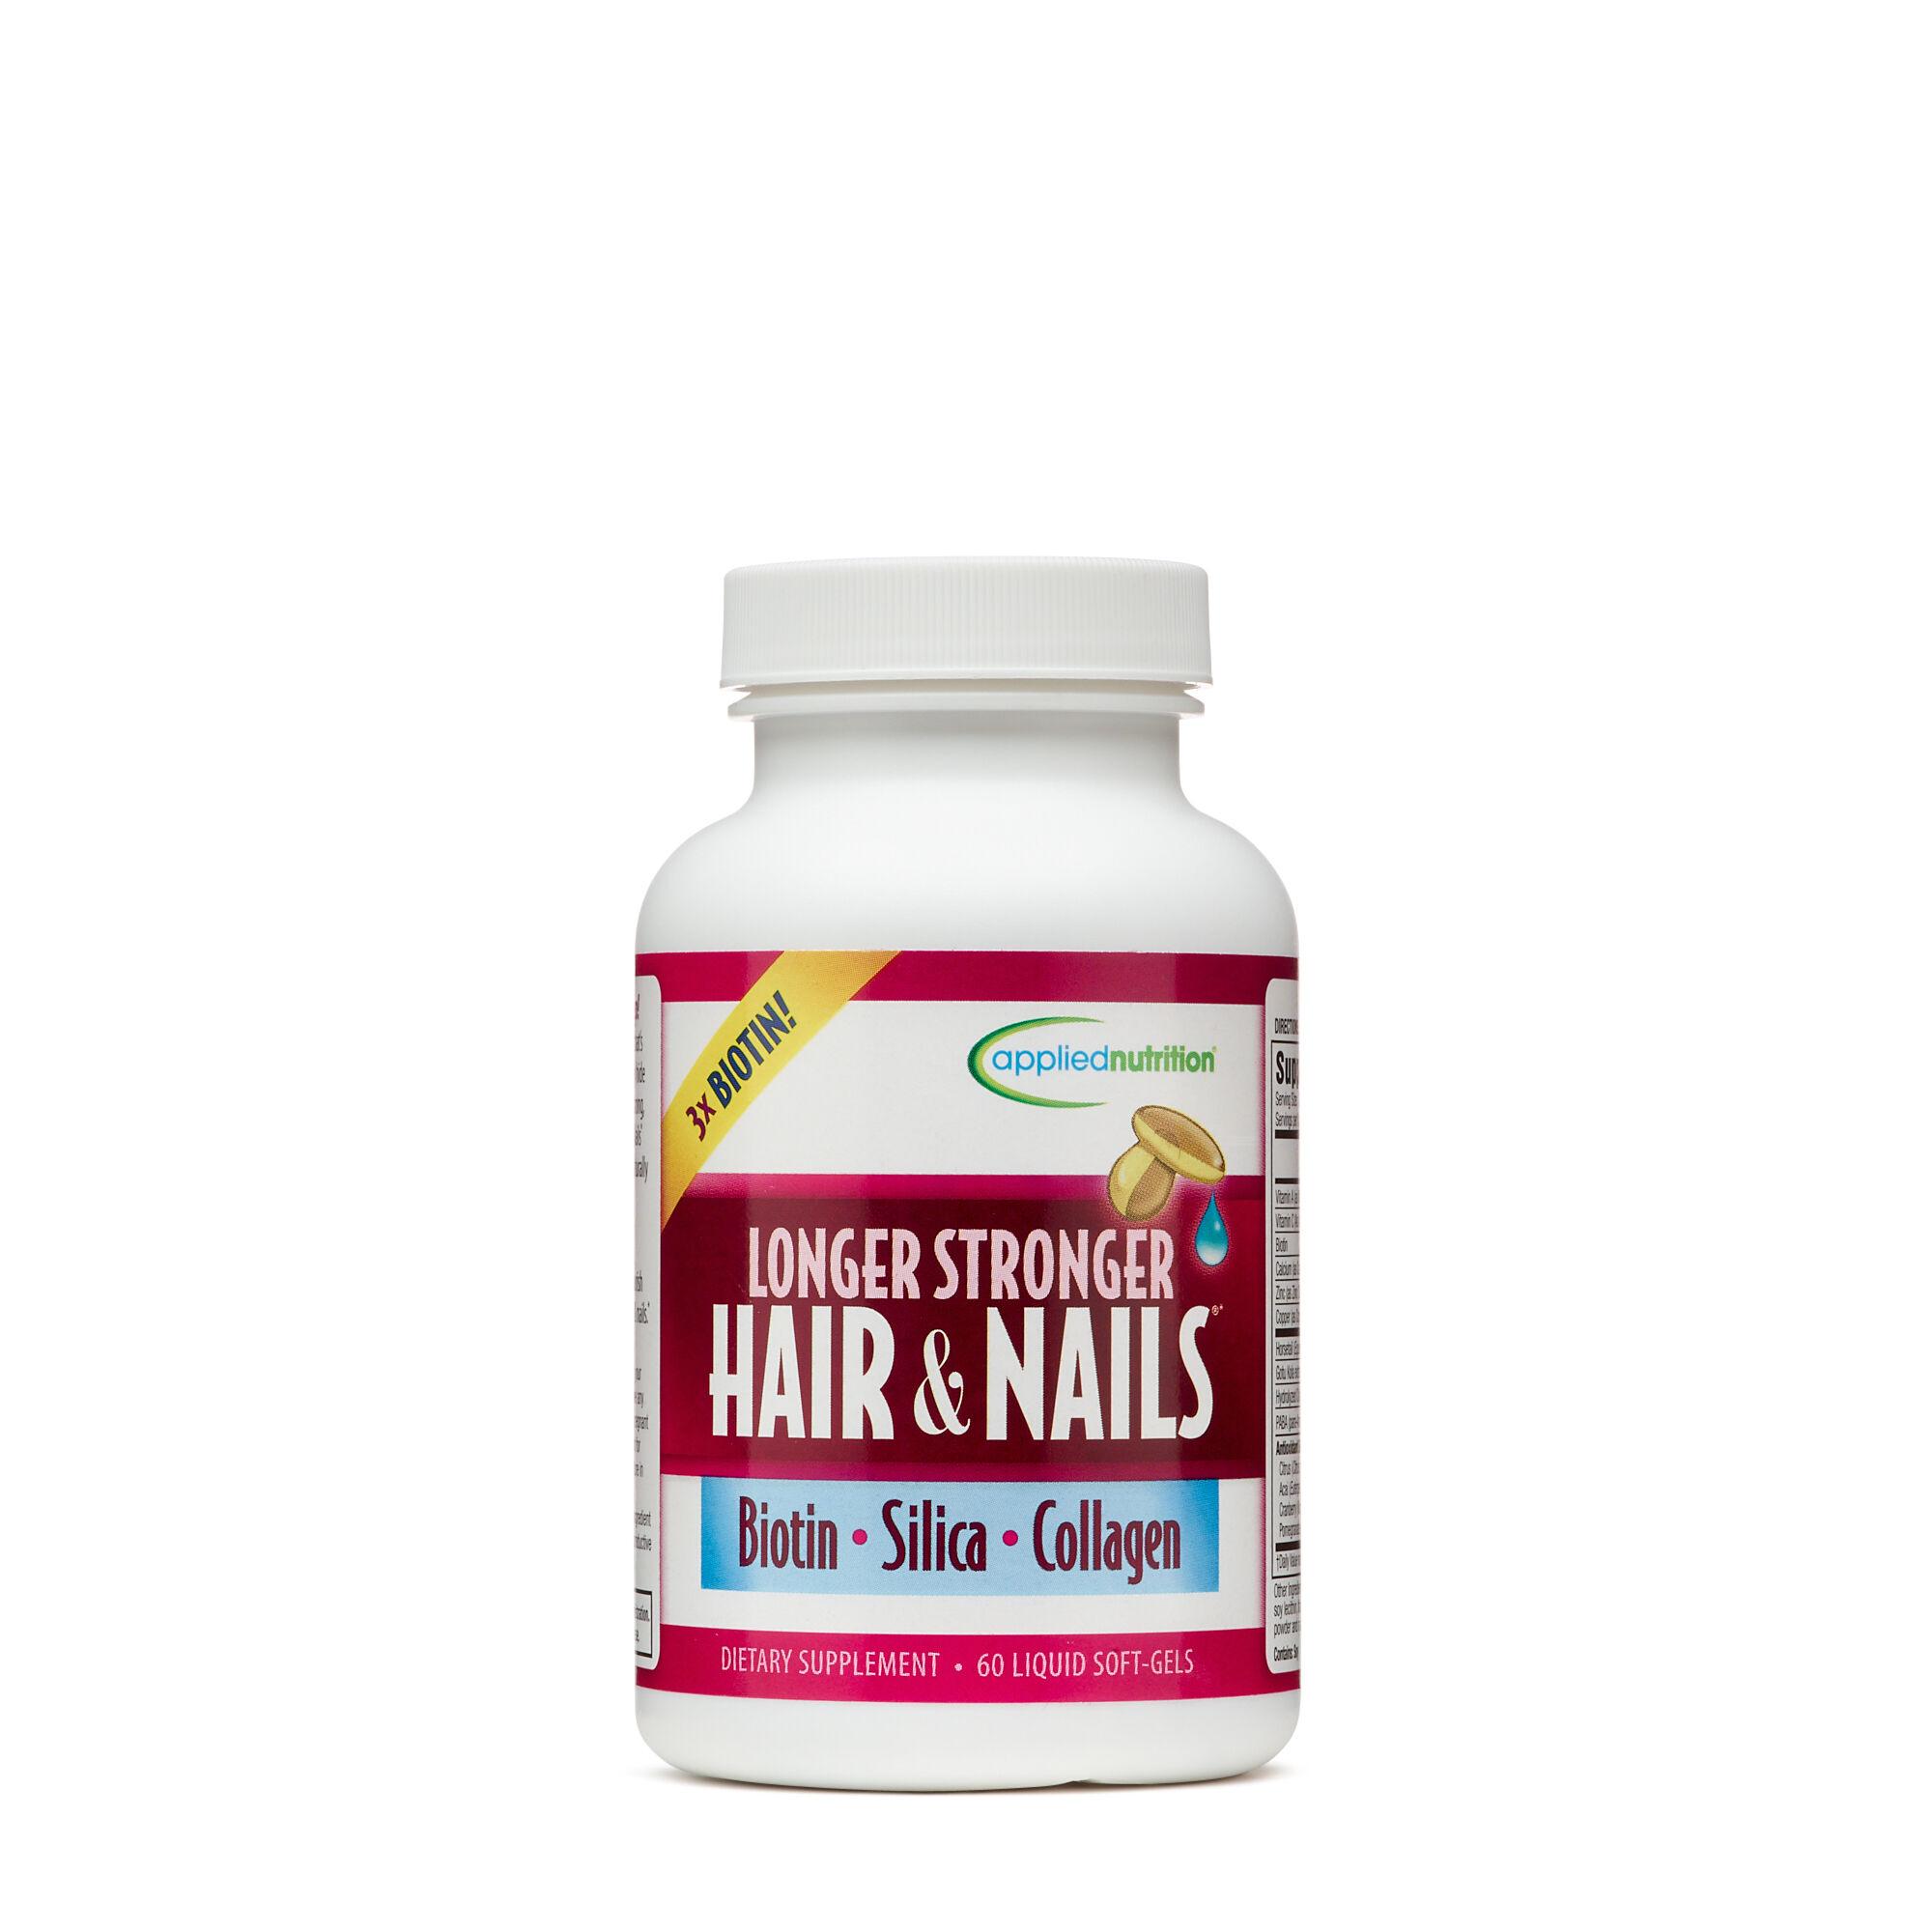 Applied Nutrition Longer Stronger Hair Nails